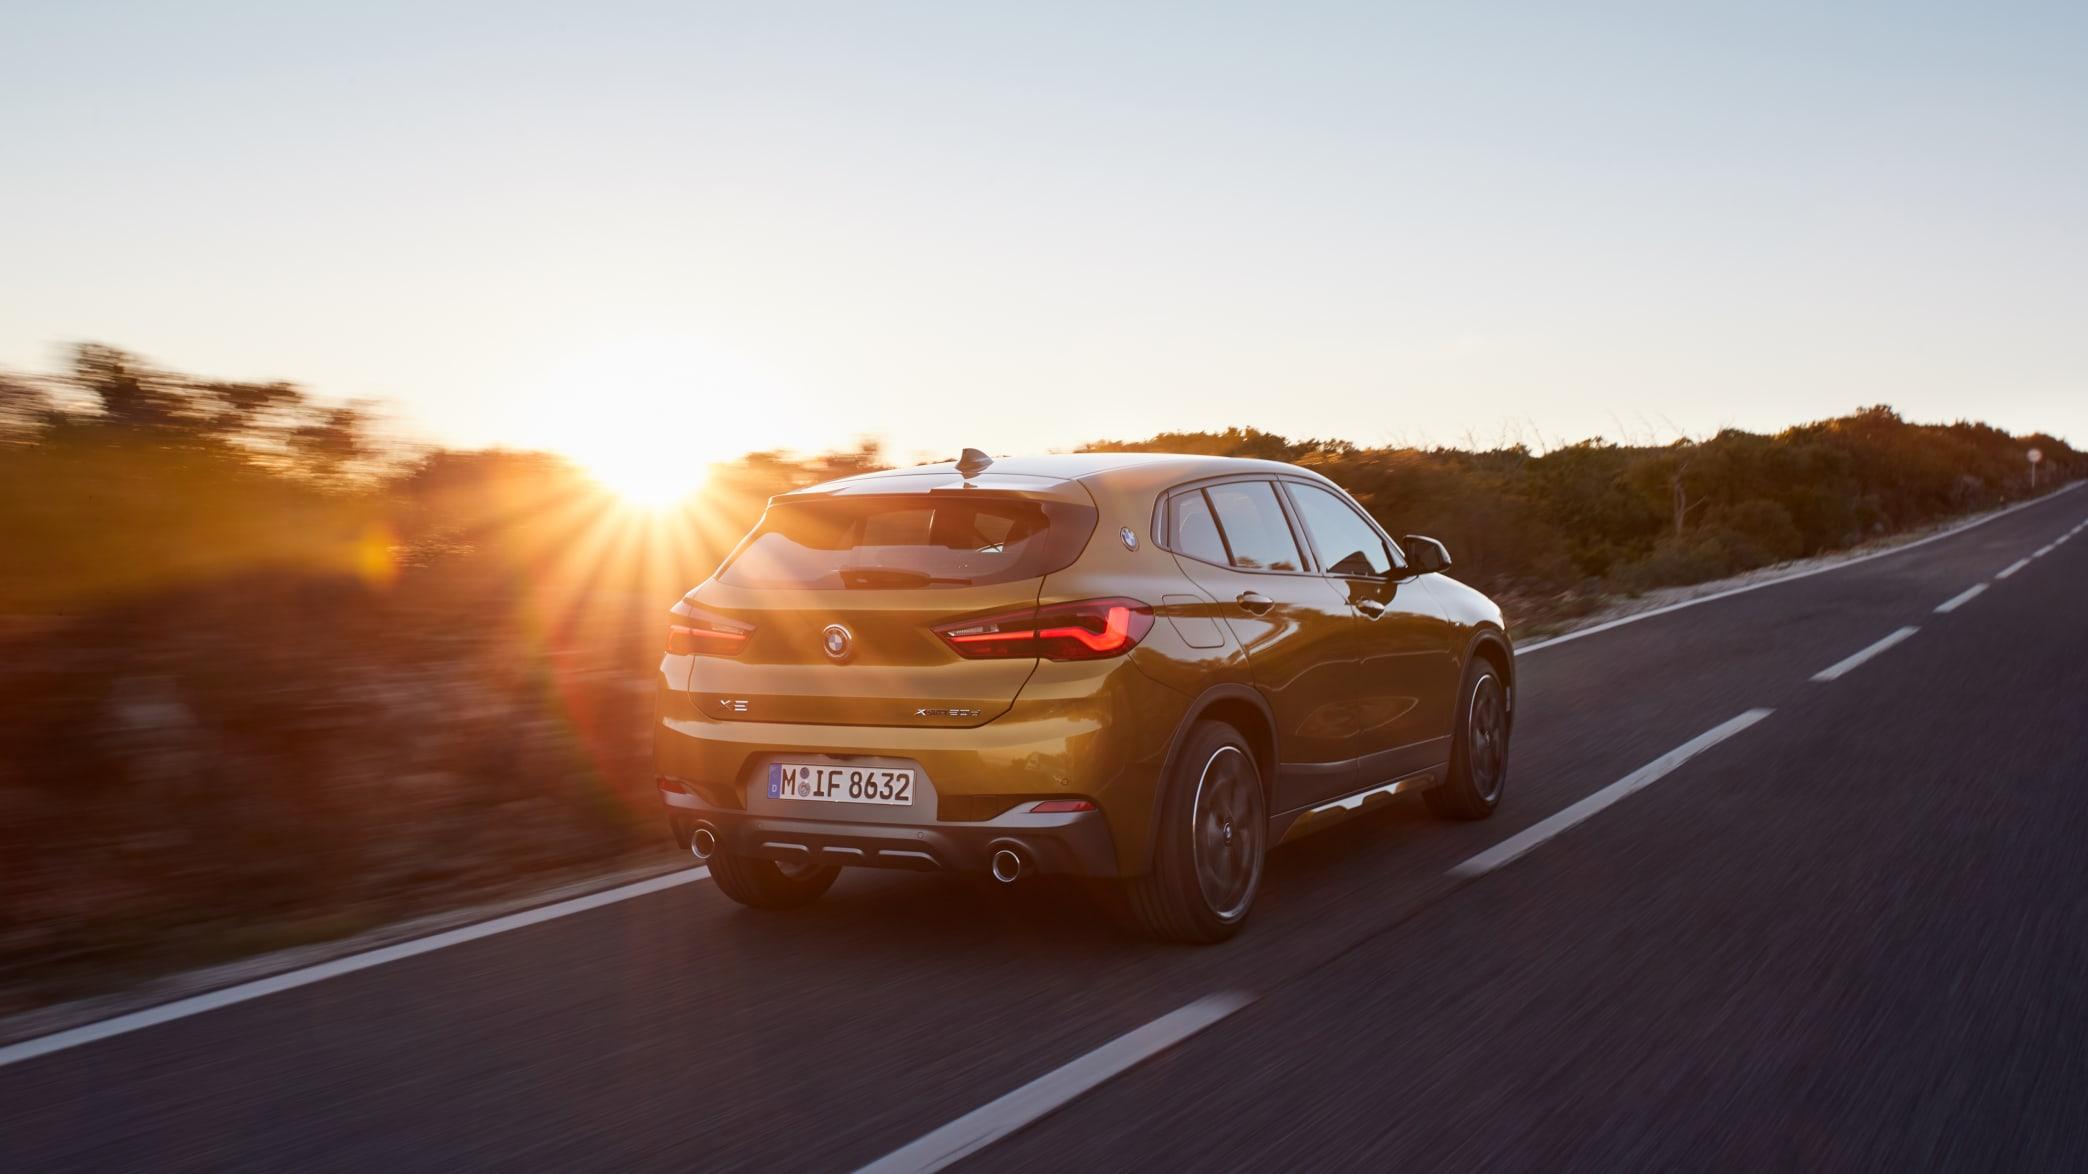 fahrender BMW X2 bei Sonnenuntergang